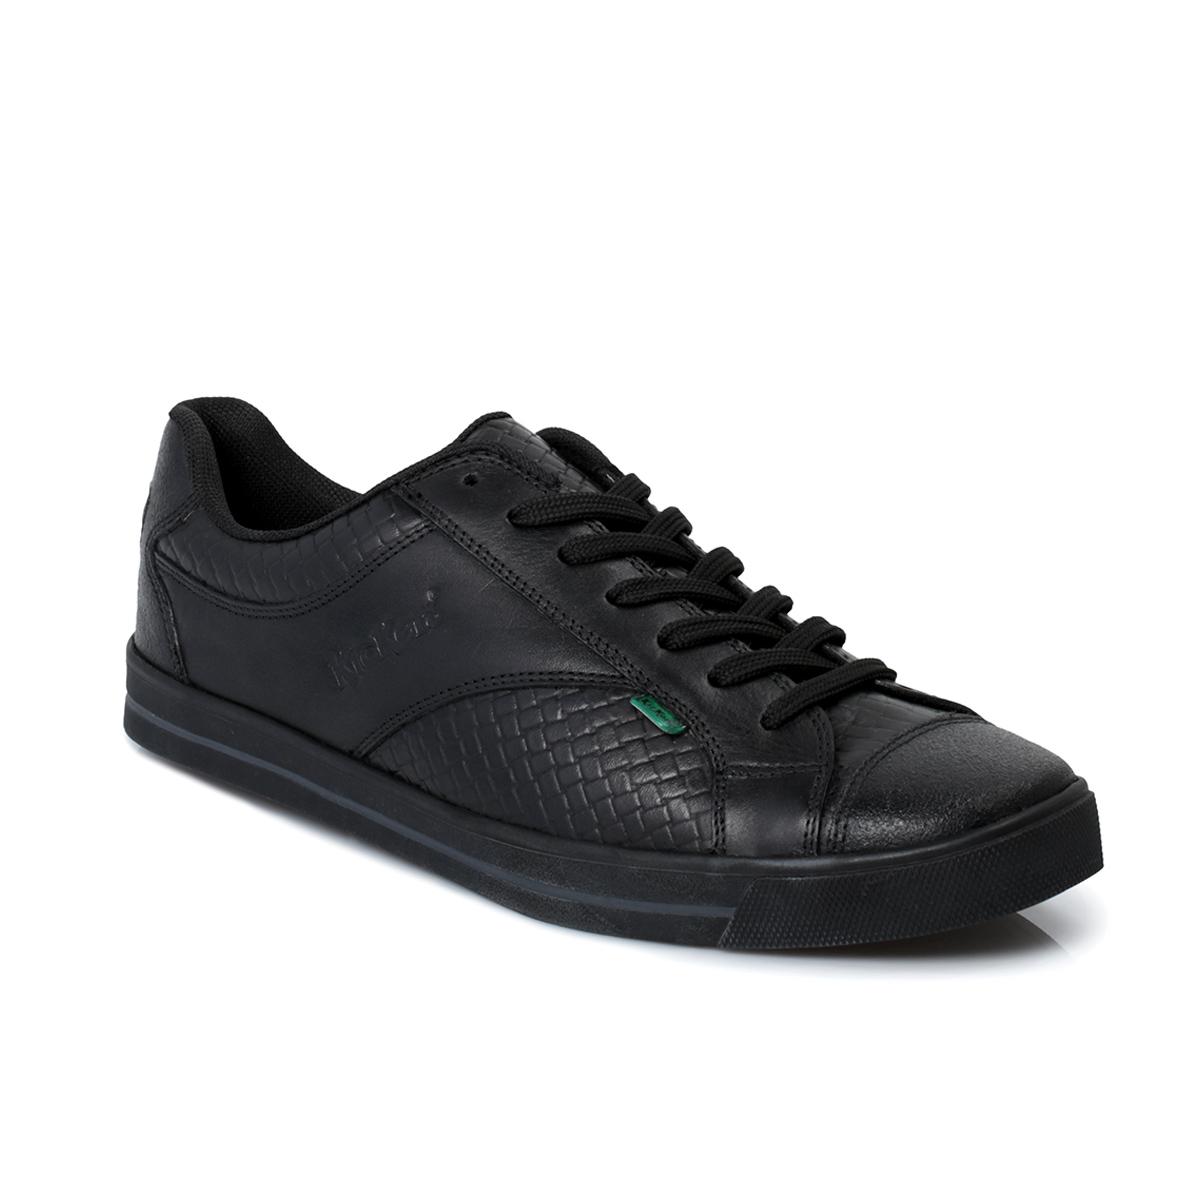 Kickers Brown Mens Shoes